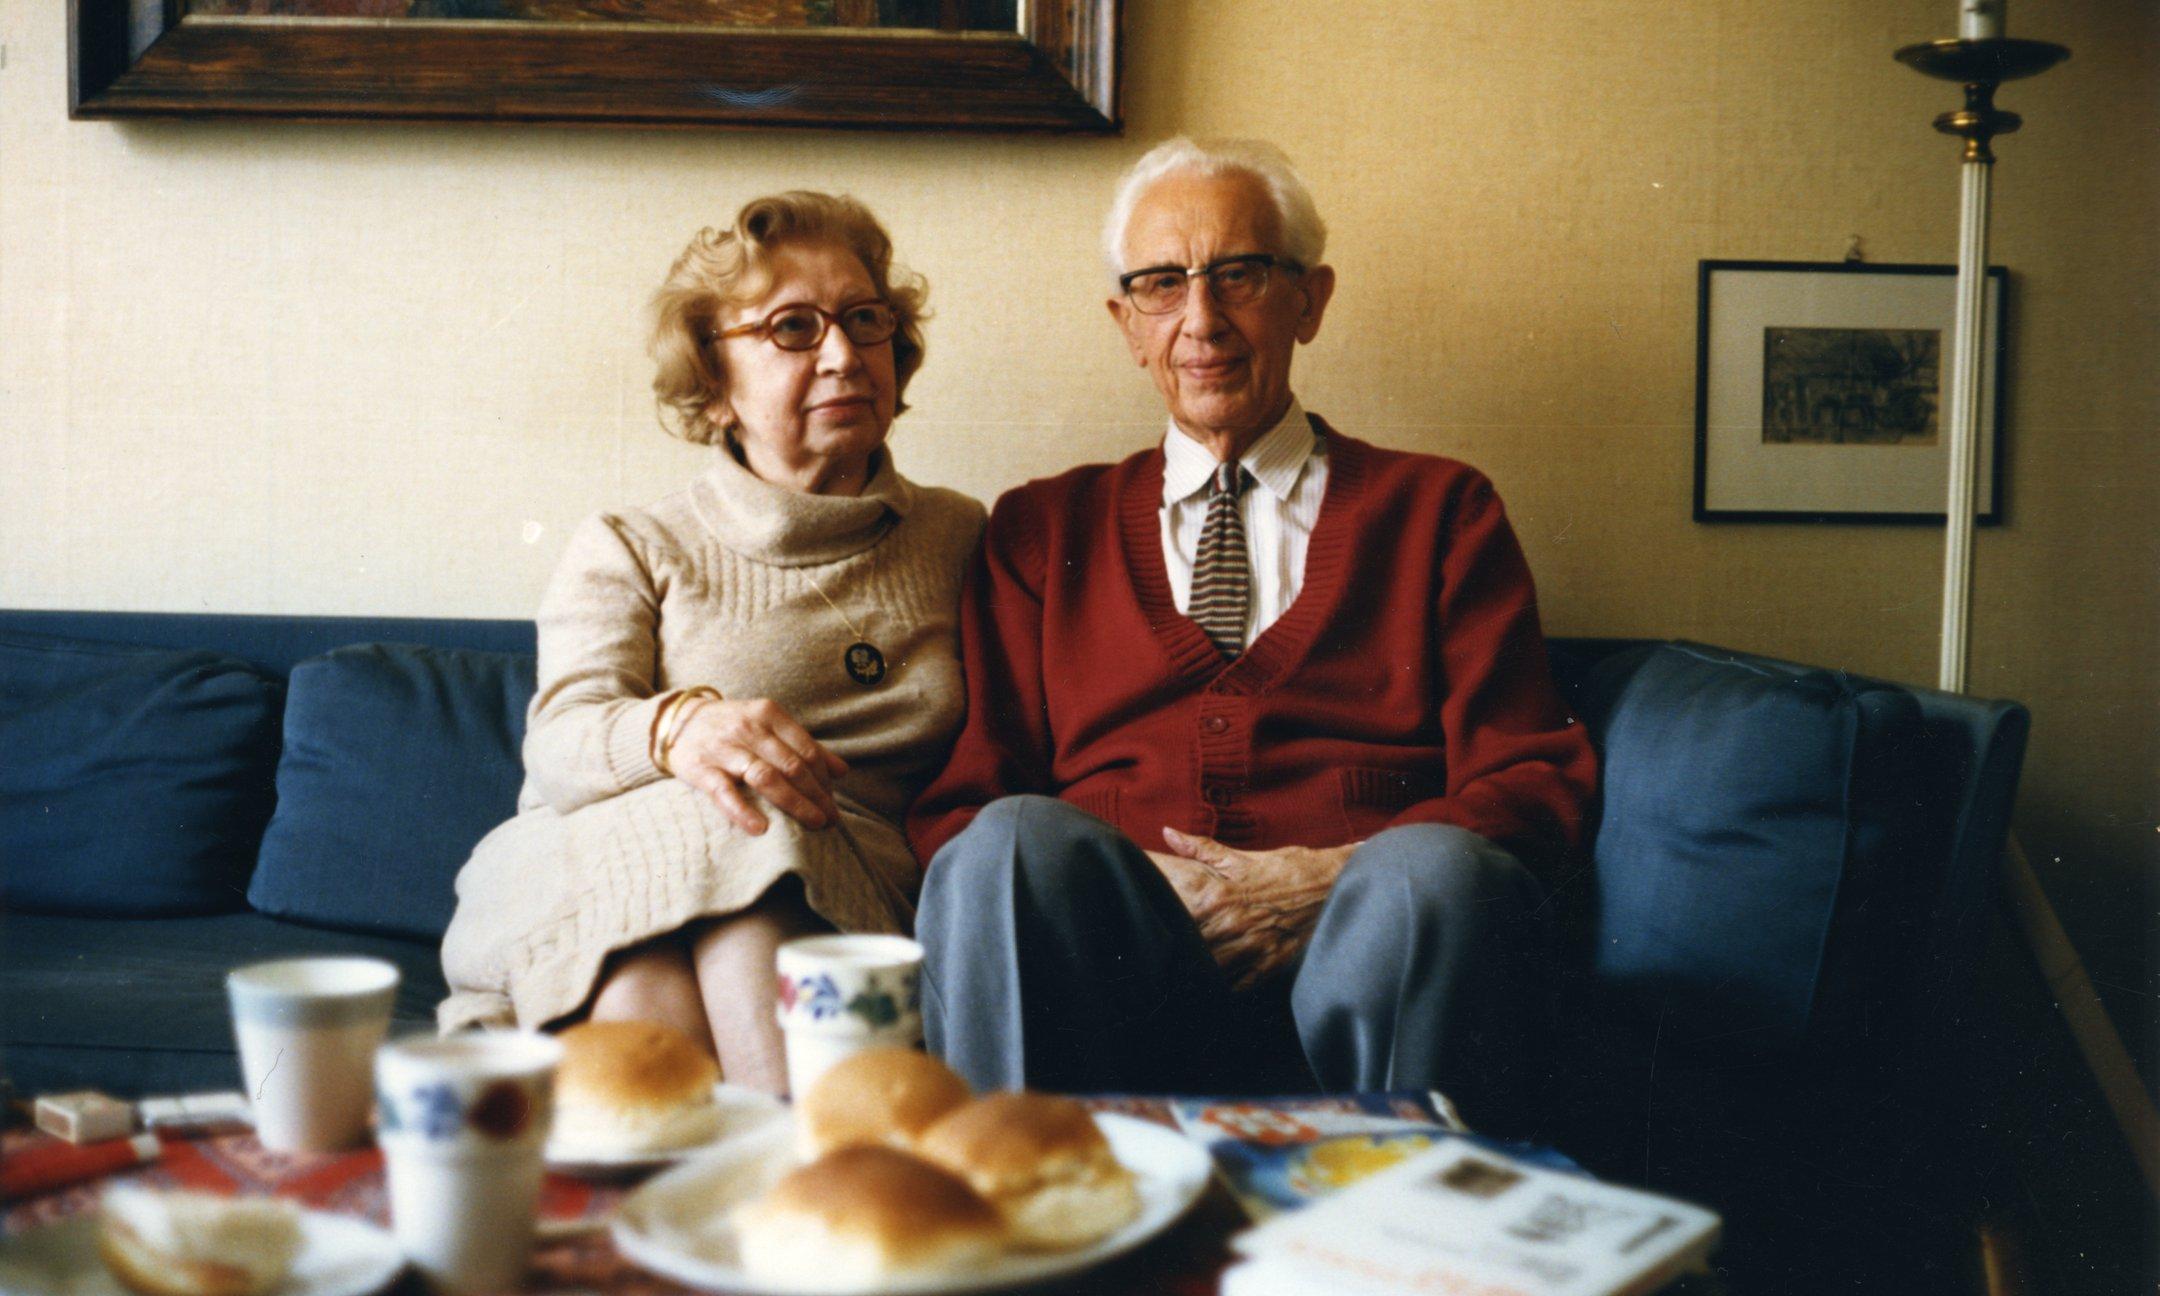 Miep and Jan Gies, around 1990.